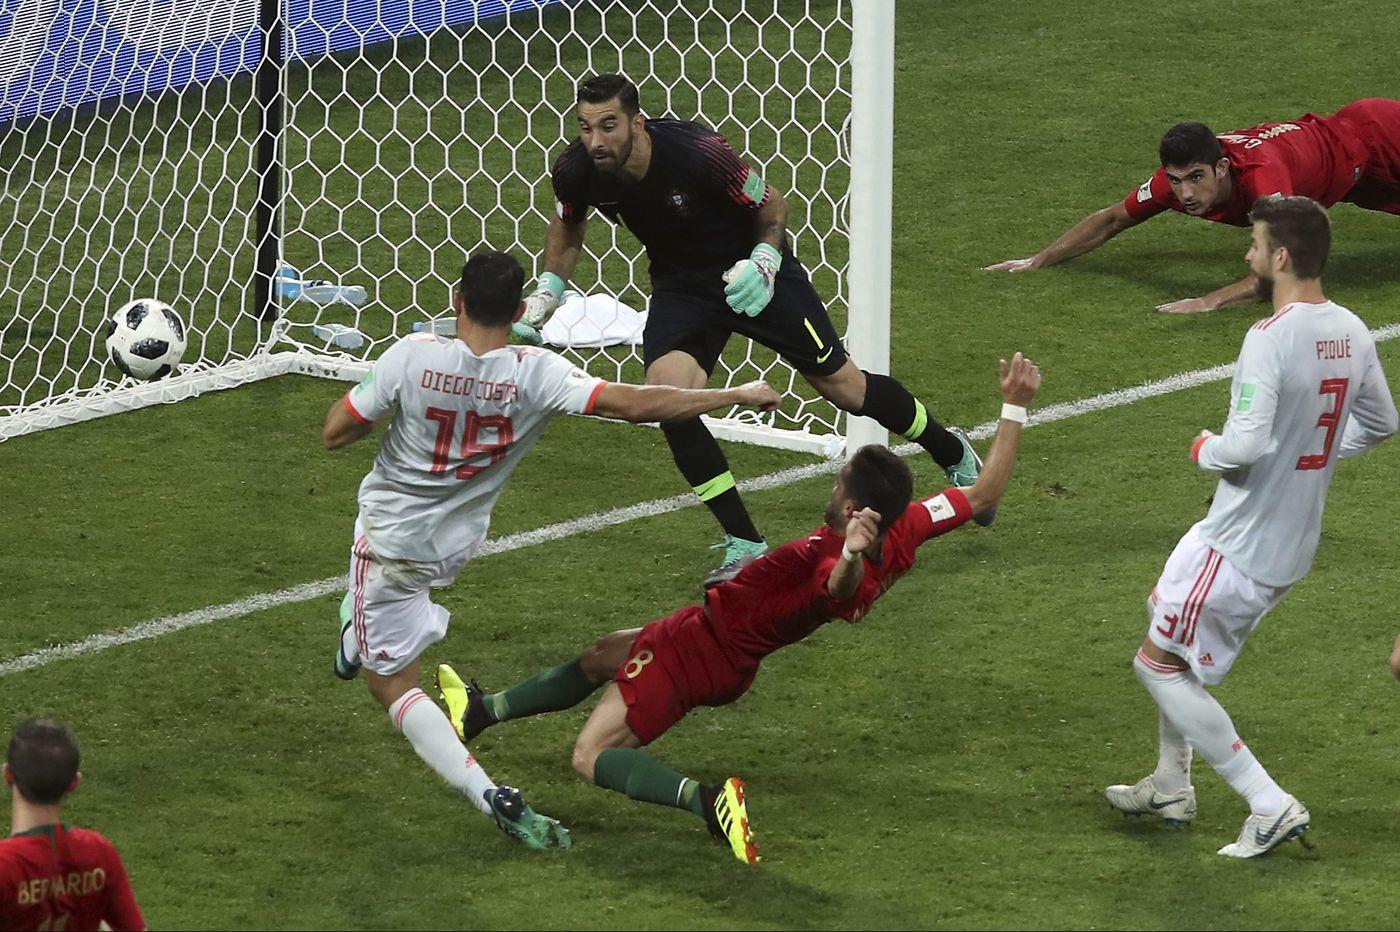 World Cup game times: Cristiano Ronaldo and Portugal play Morocco, followed by Uruguay-Saudi Arabia, Iran-Spain